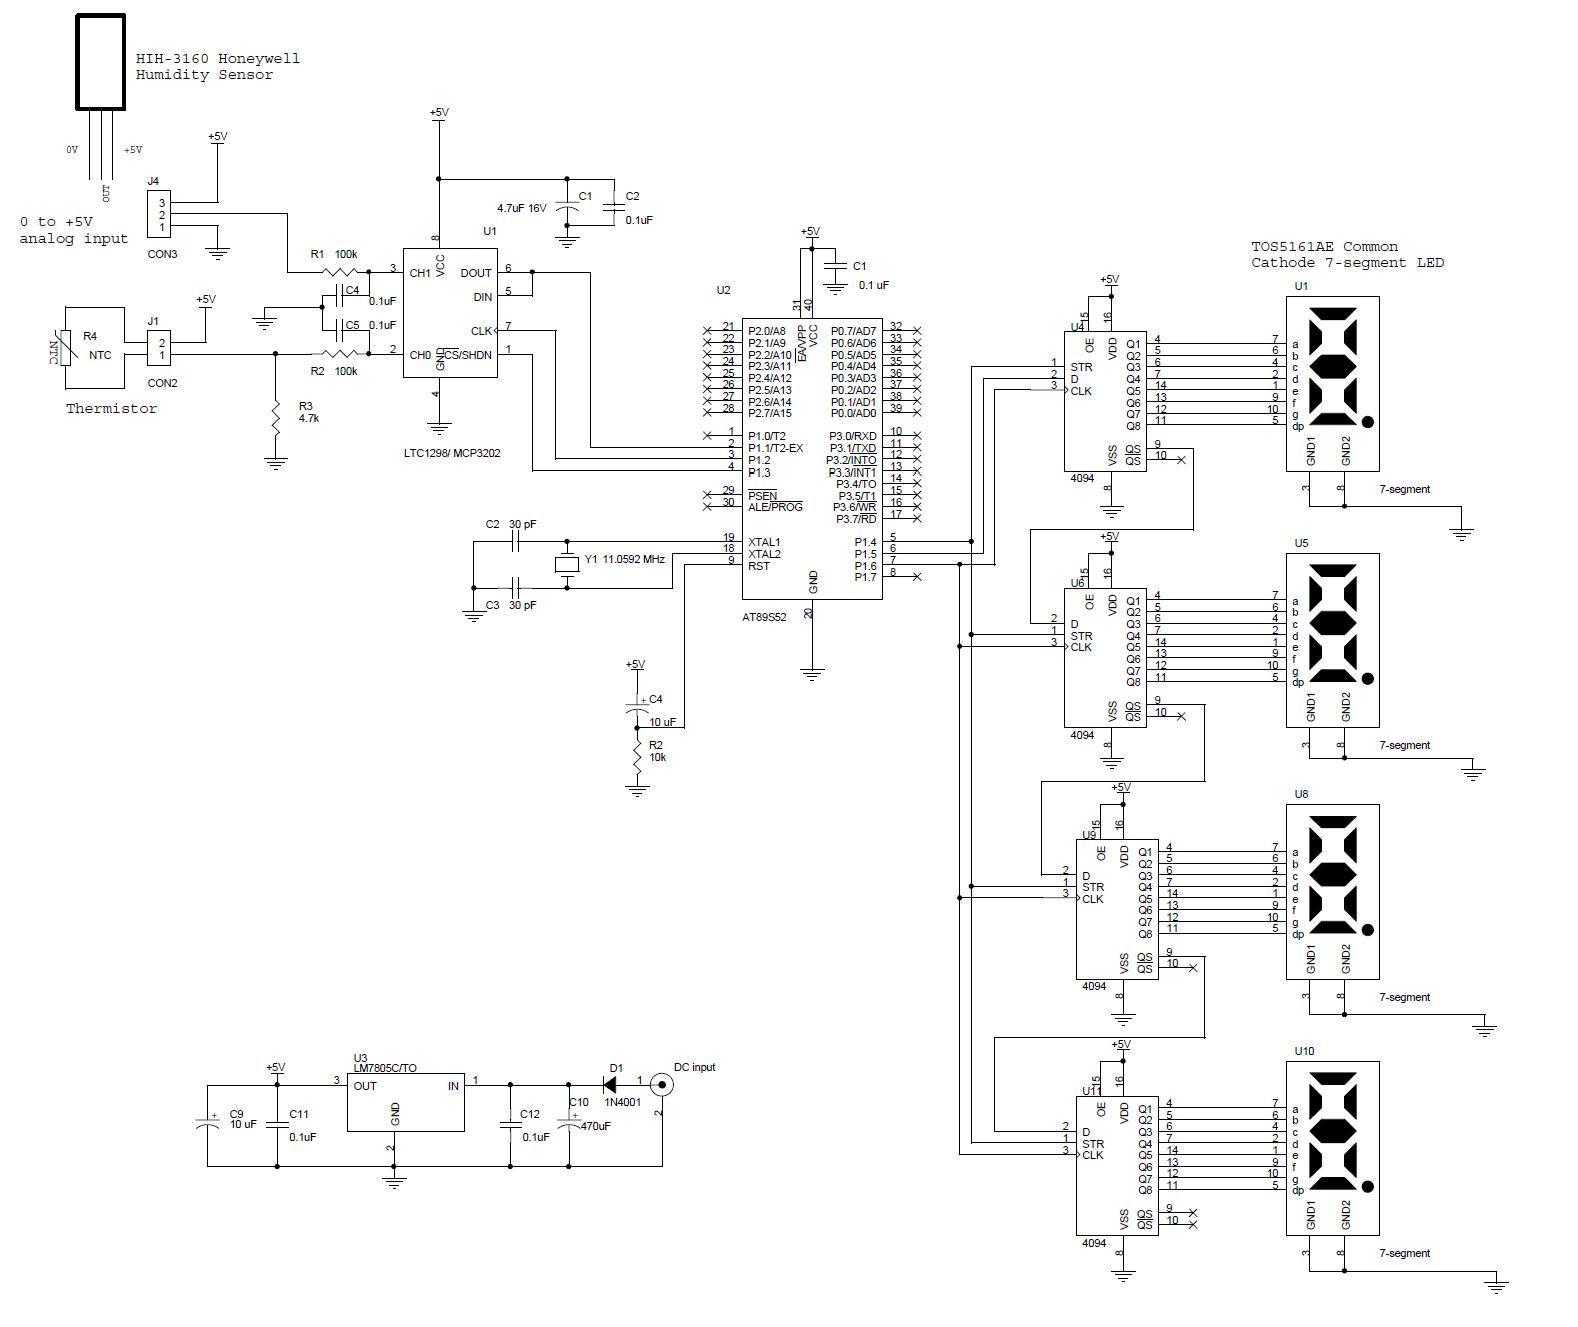 Koleksi Skema Rangkaian Artikel Elektronika May 2010